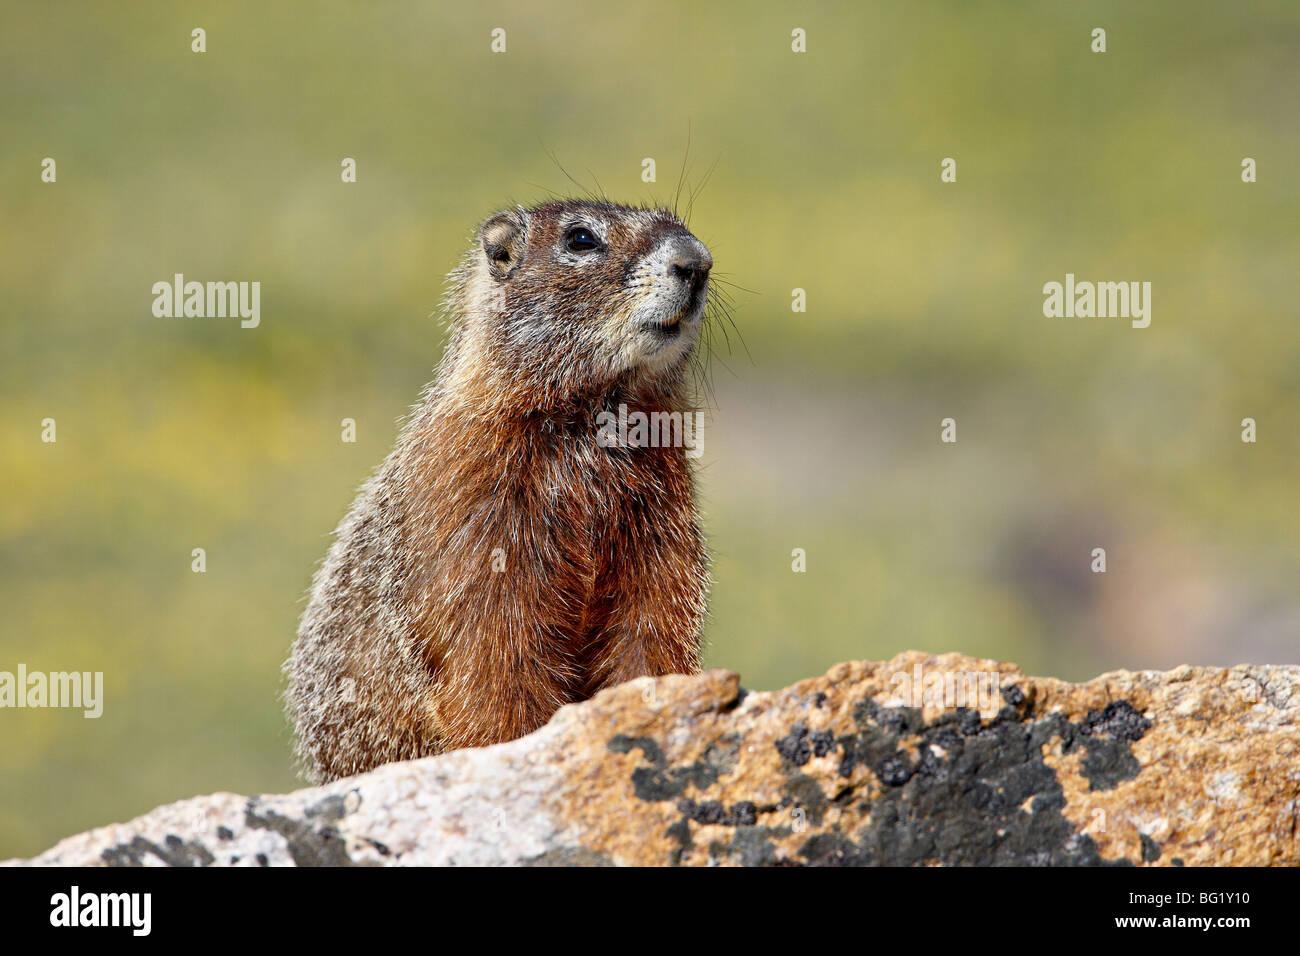 Yellowbelly marmot (Marmota flaviventris), Shoshone National Forest, Wyoming, United States of America, North America - Stock Image